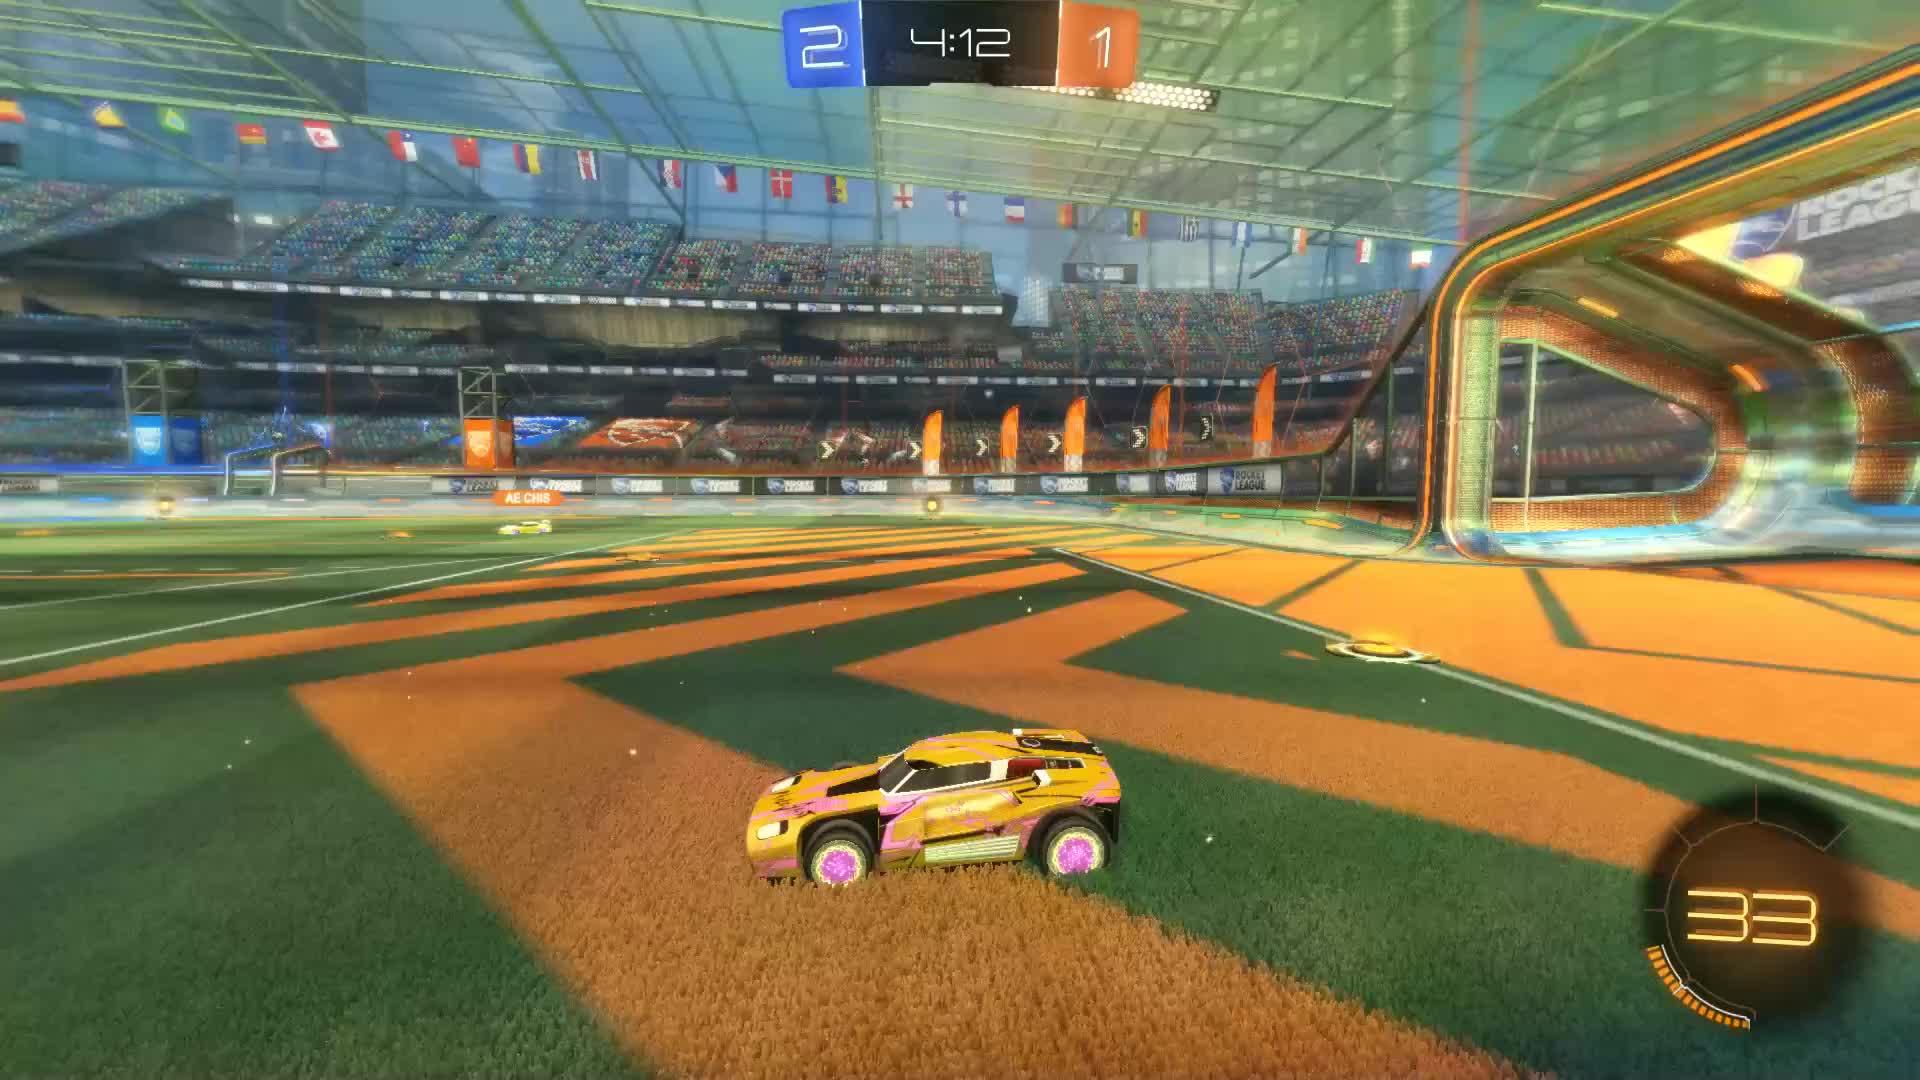 Gif Your Game, GifYourGame, Goal, Rocket League, RocketLeague, W1ZarD, Goal 4: W1ZarD GIFs